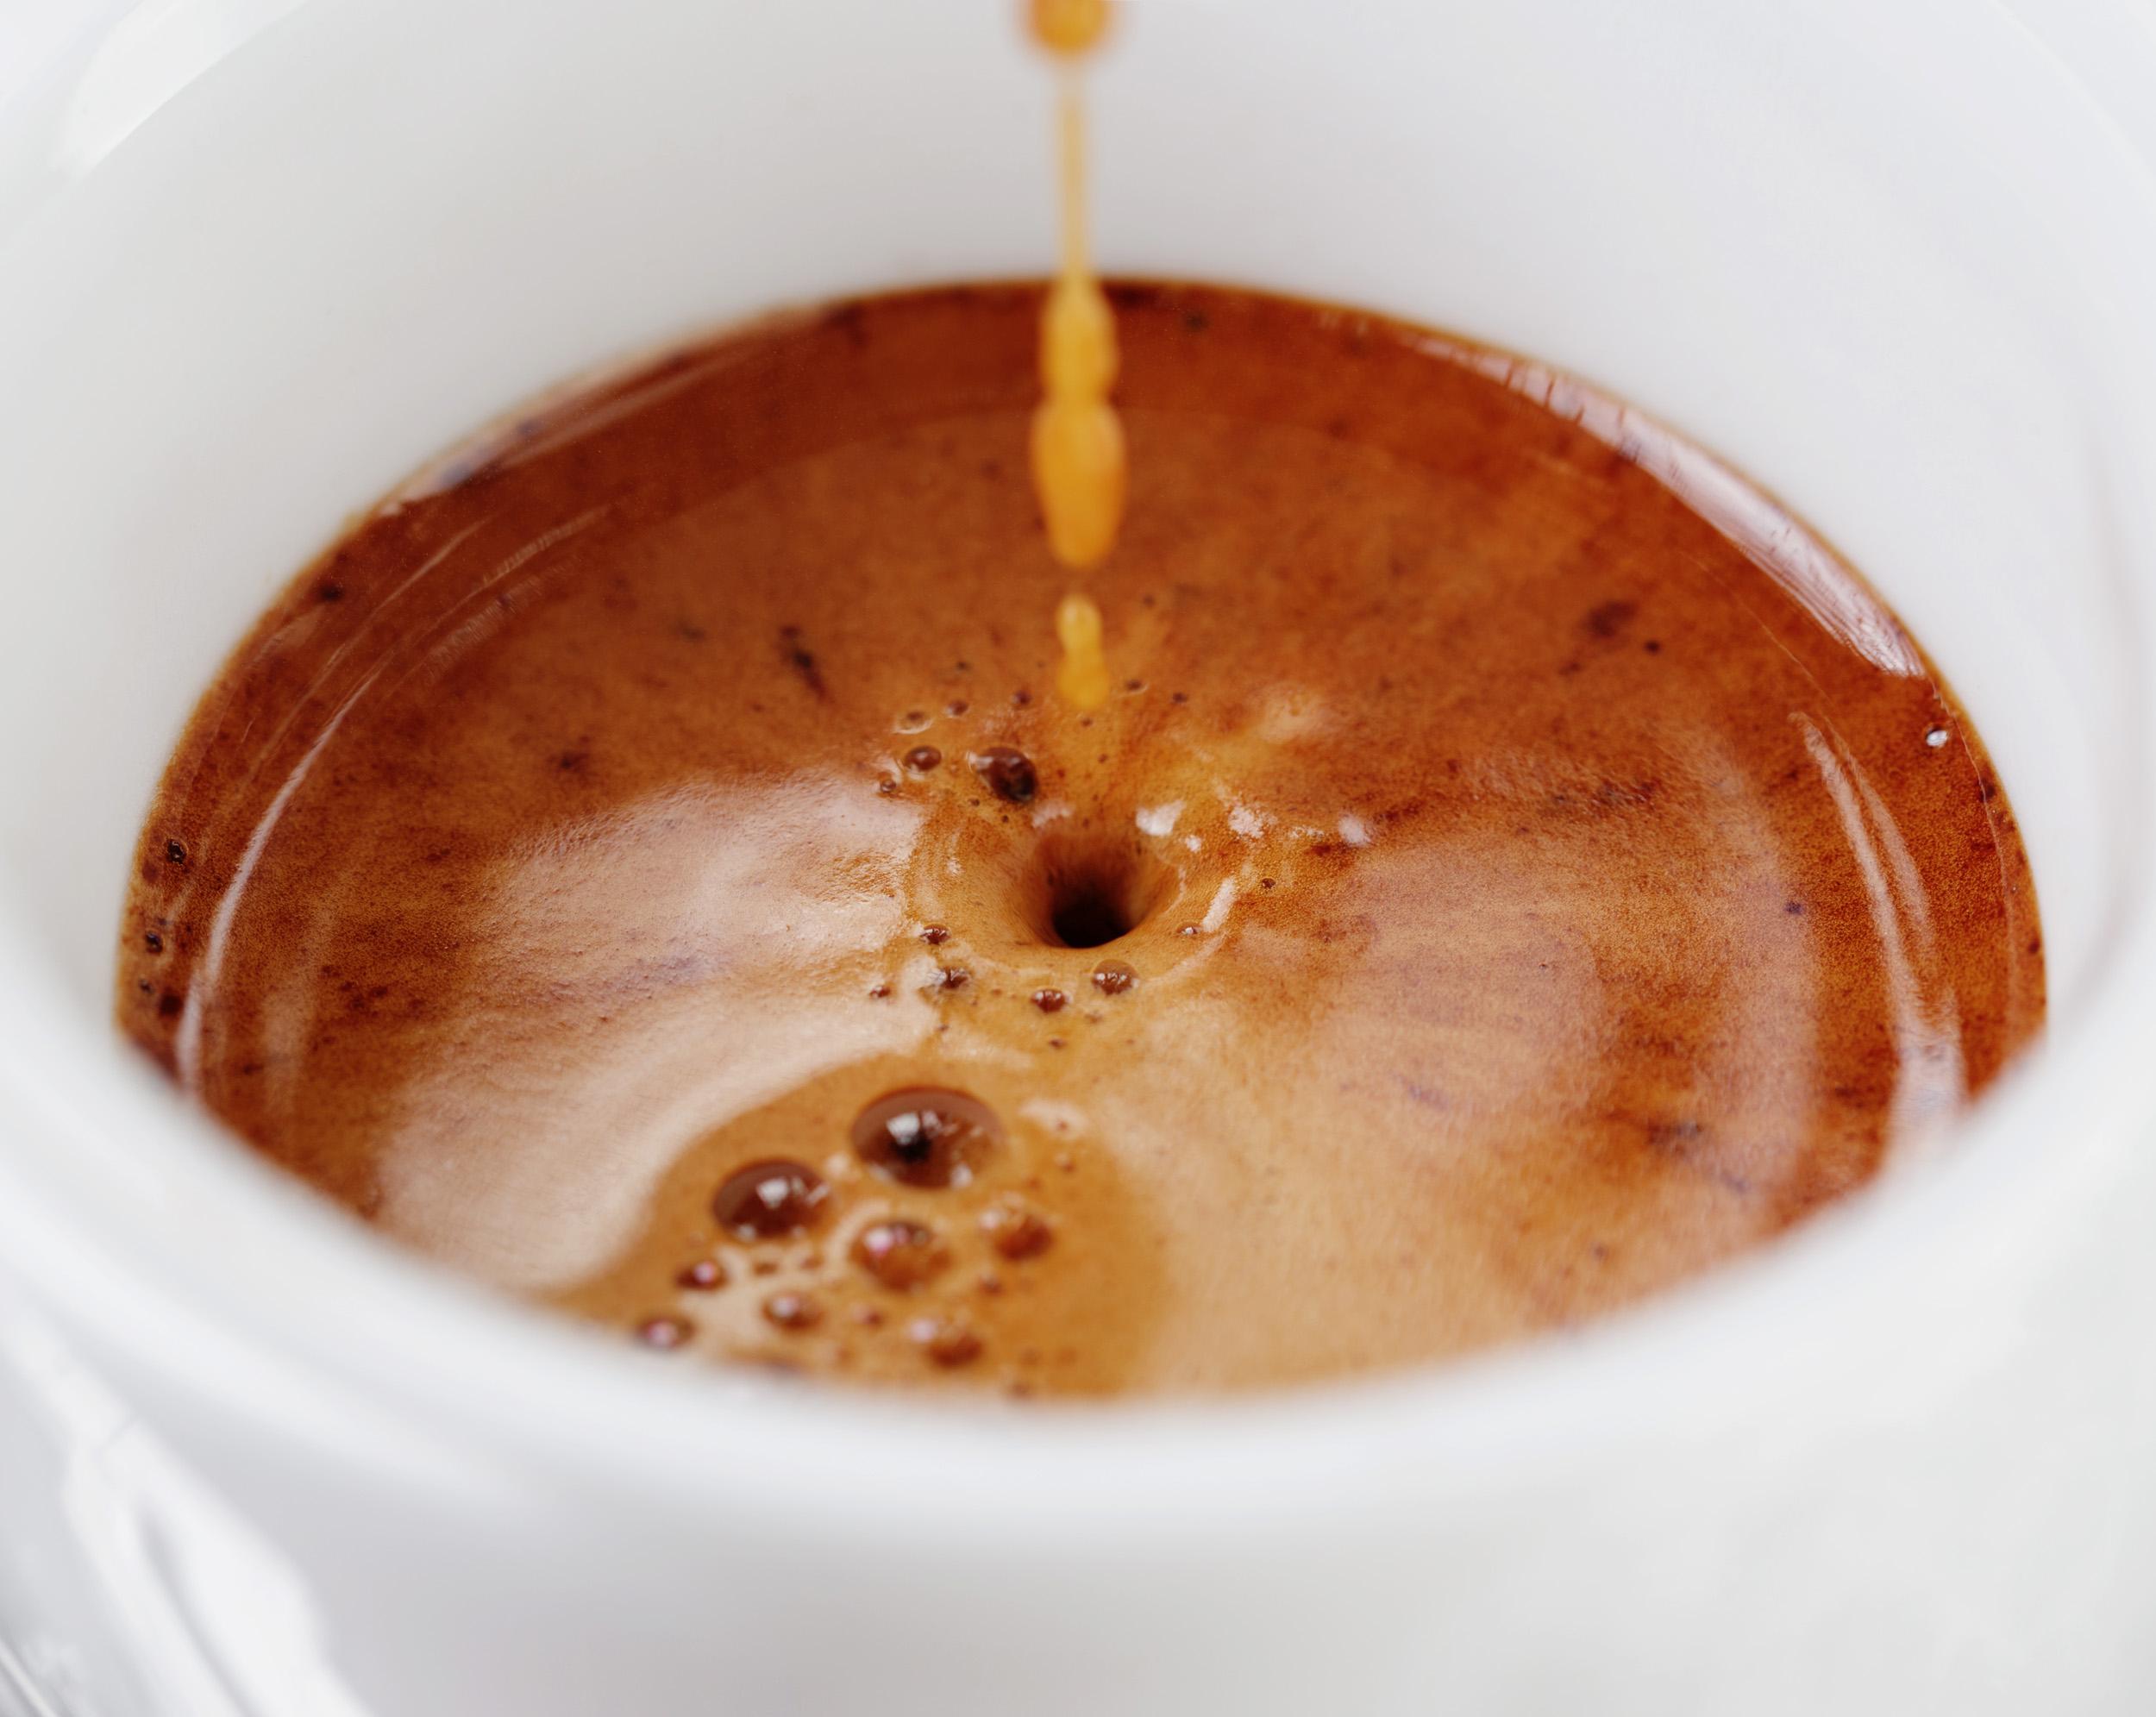 Chuyên mục Cà phê Espresso - PrimeCoffee